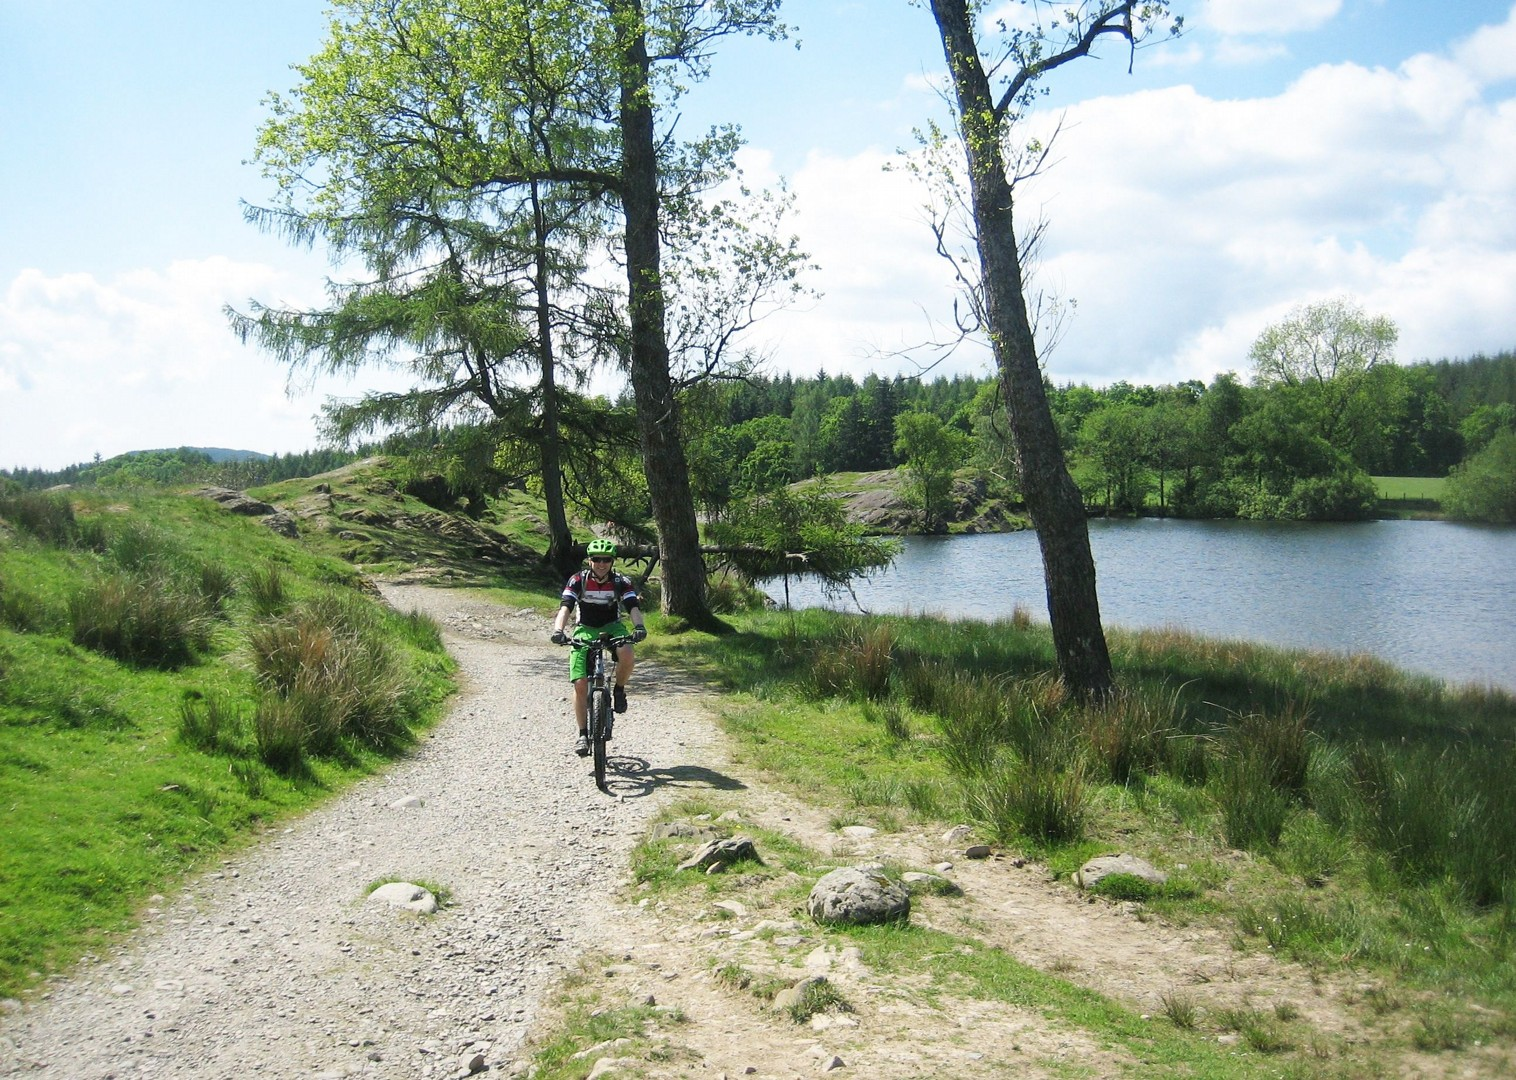 Mountain-Bike-Weekend-UK-Lake-District-Classic-Coniston-6.jpg - UK - Lake District - Classic Coniston - Guided Mountain Bike Weekend - Mountain Biking